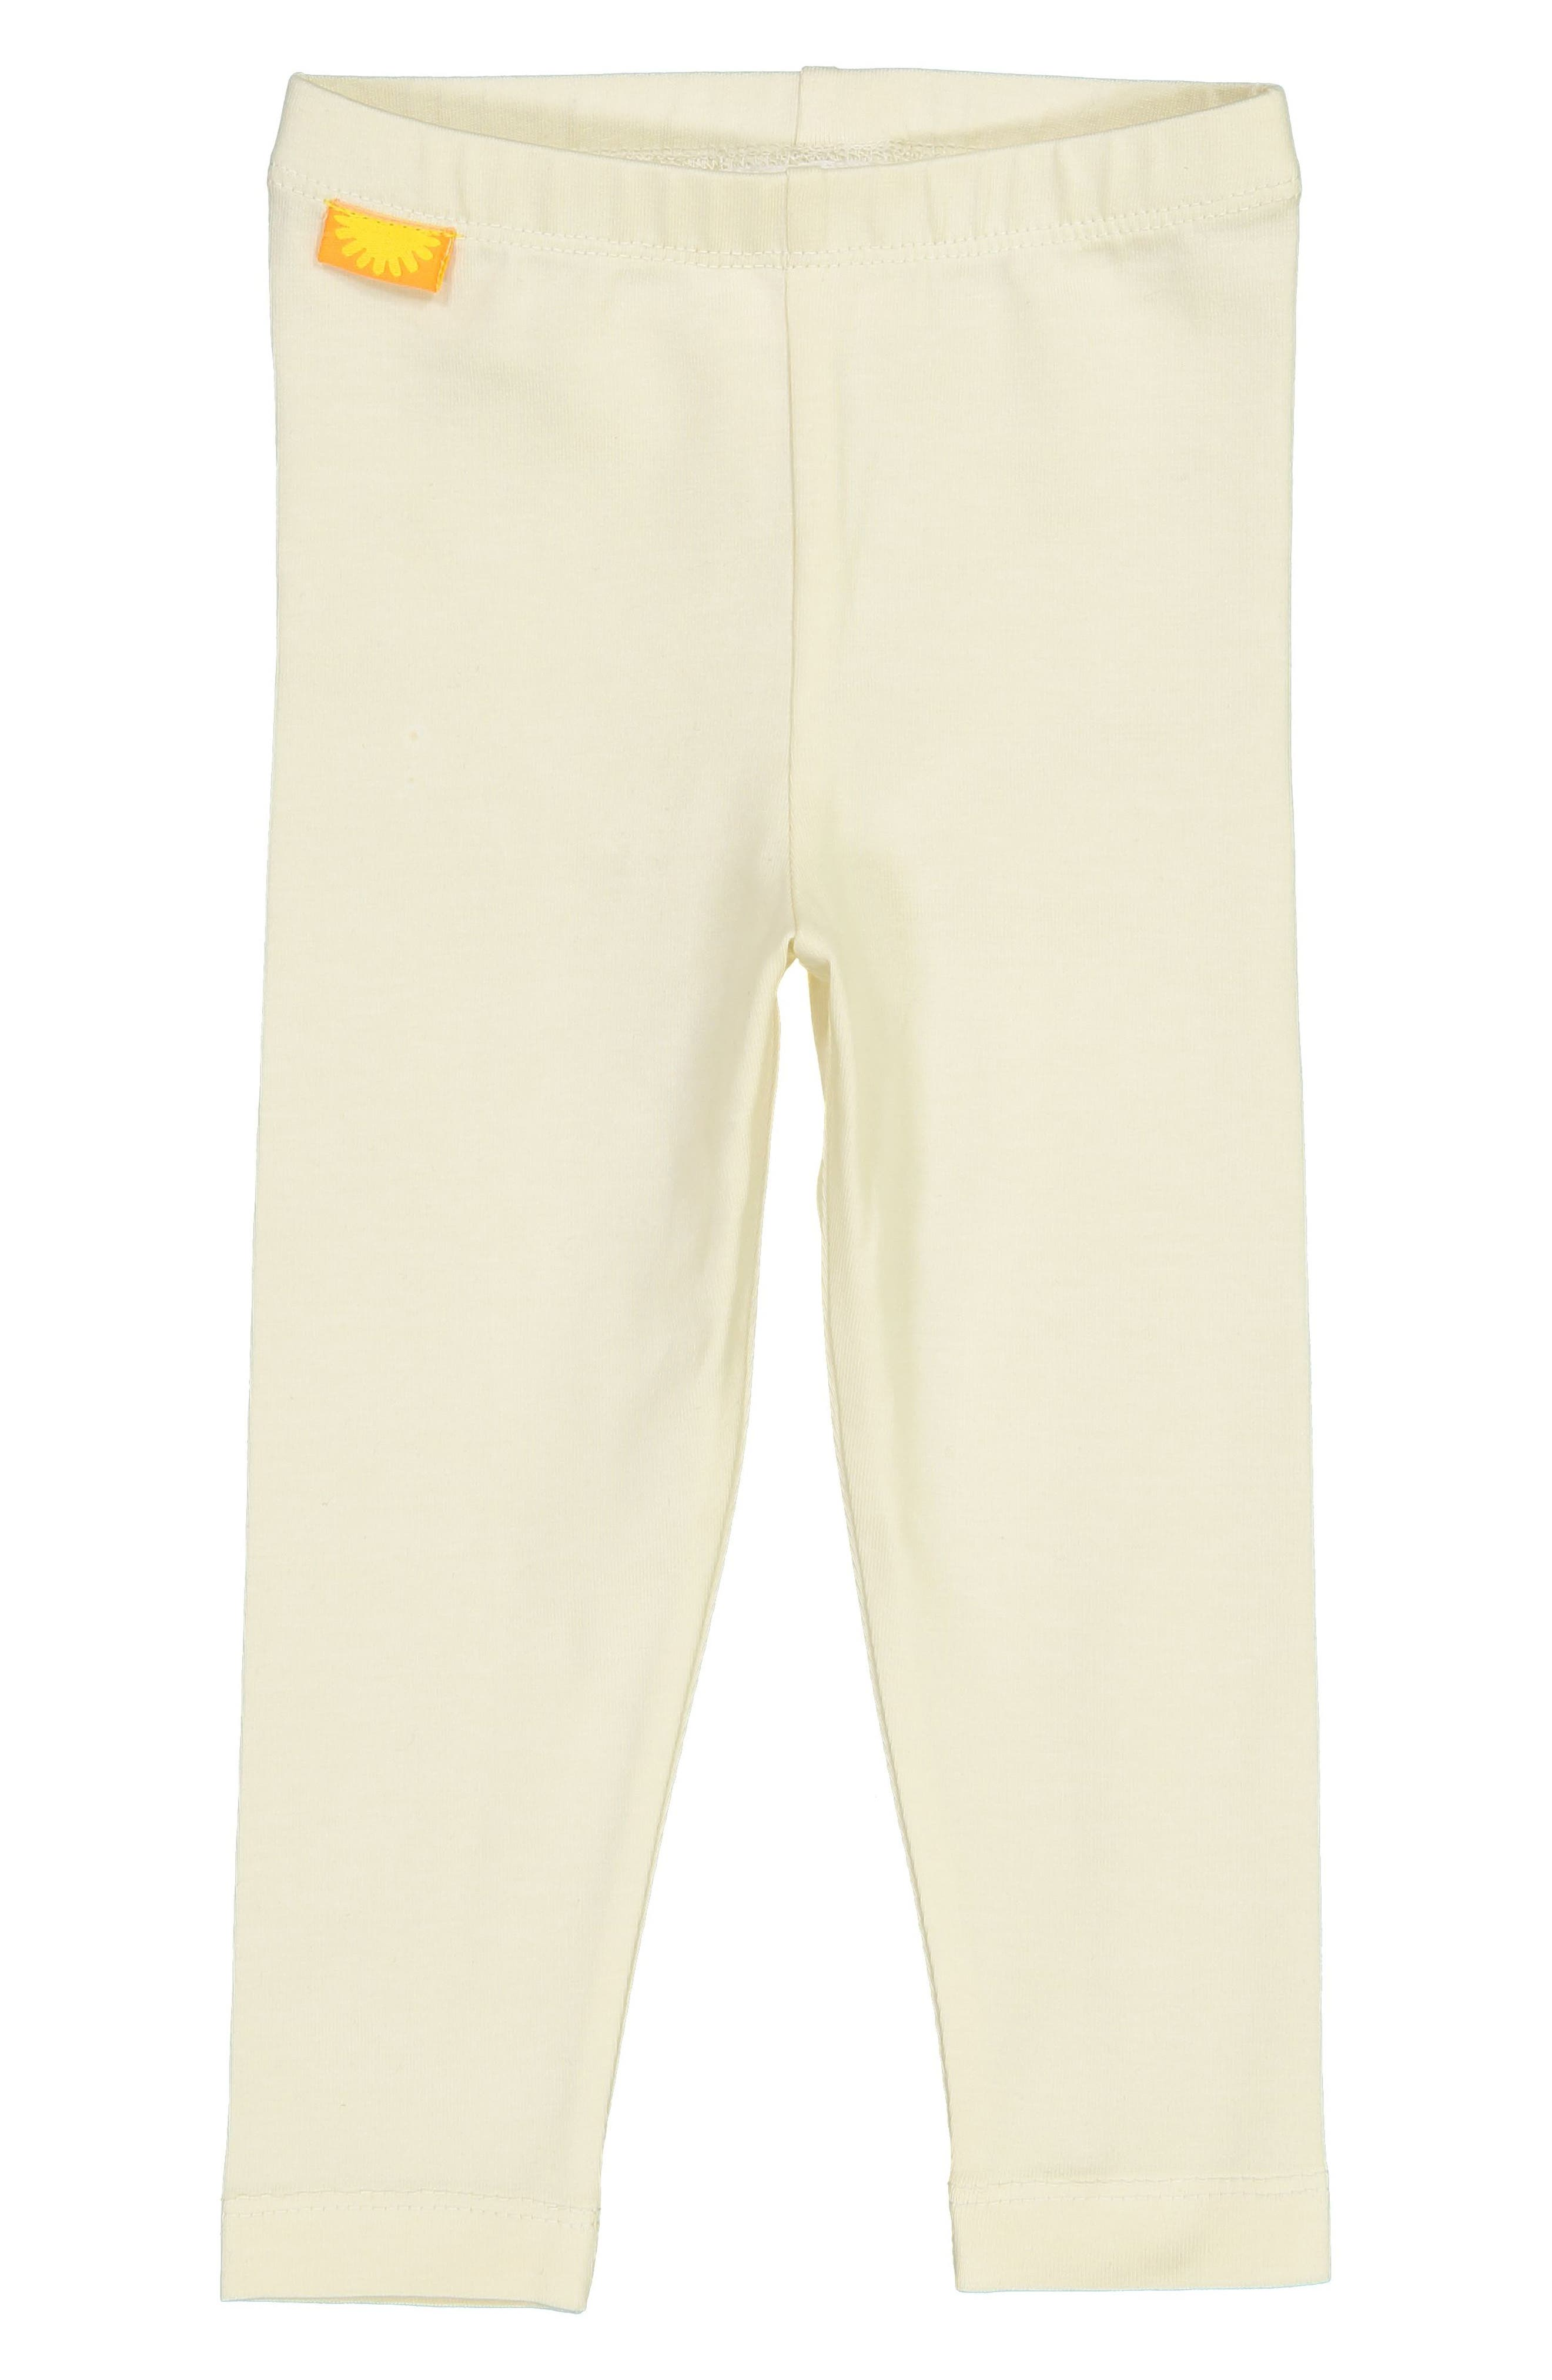 Stretch Organic Cotton Leggings,                         Main,                         color, WHITE